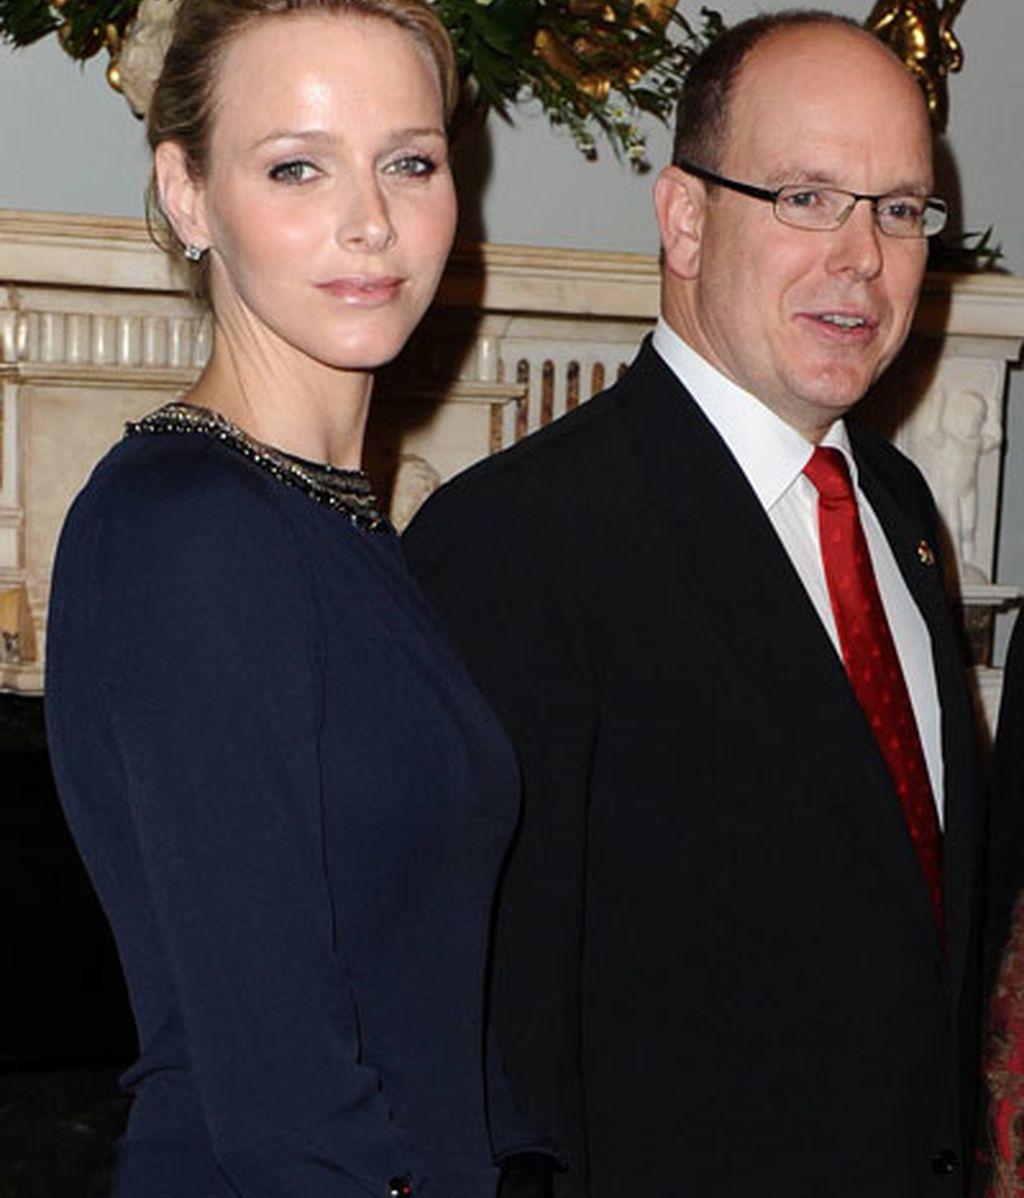 Alberto de Mónaco y su prometida Charlene Wittstock